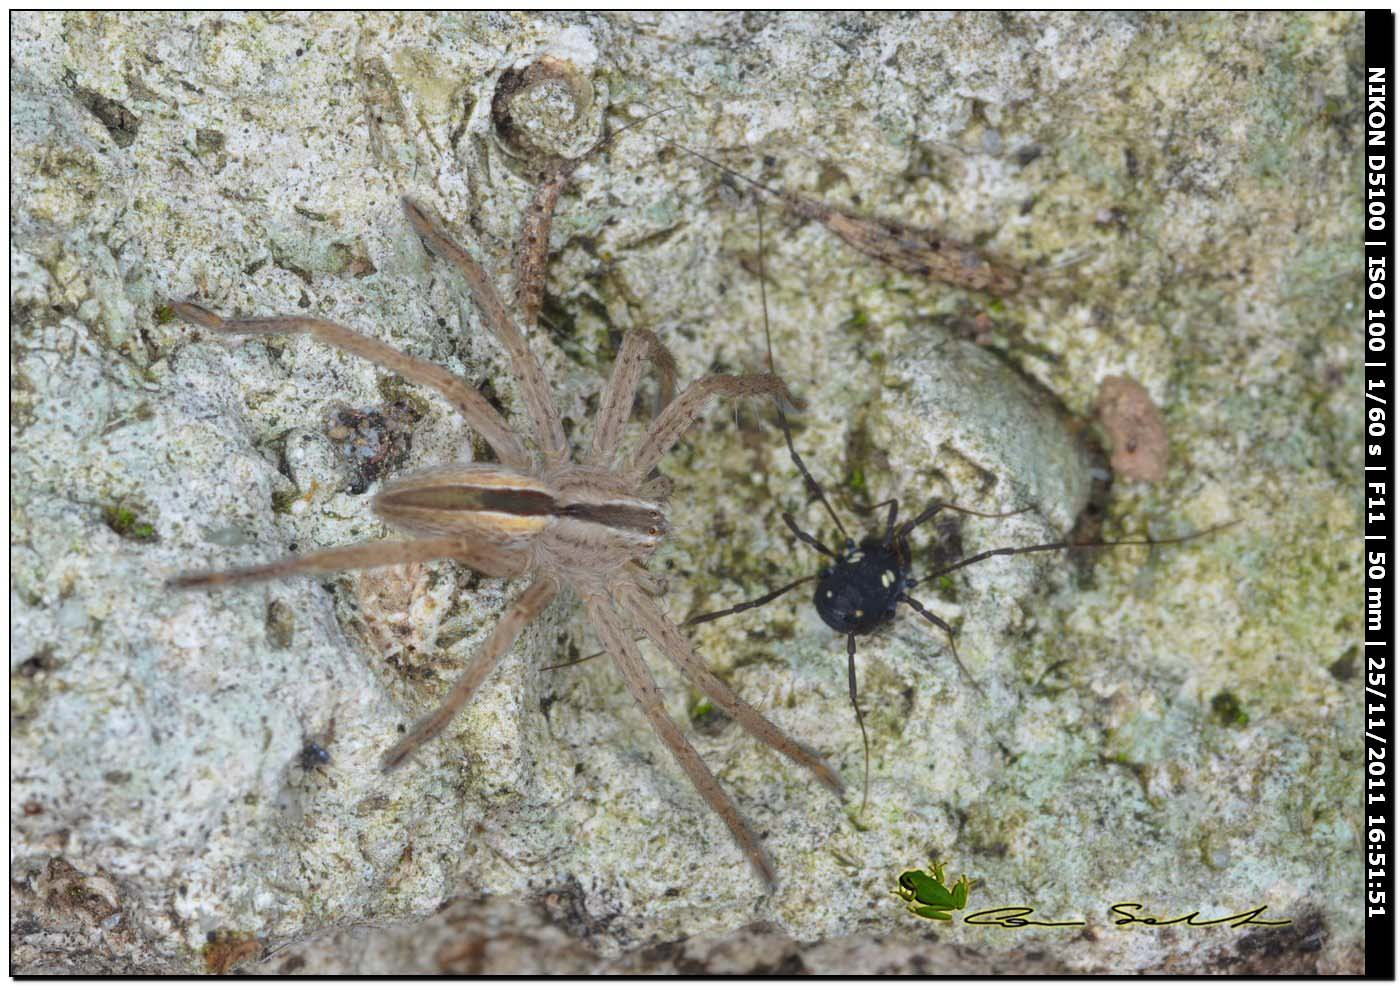 Nemastomatidae: Histricostoma argenteolunulatum [e ragno Micrommata cfr. ligurina]